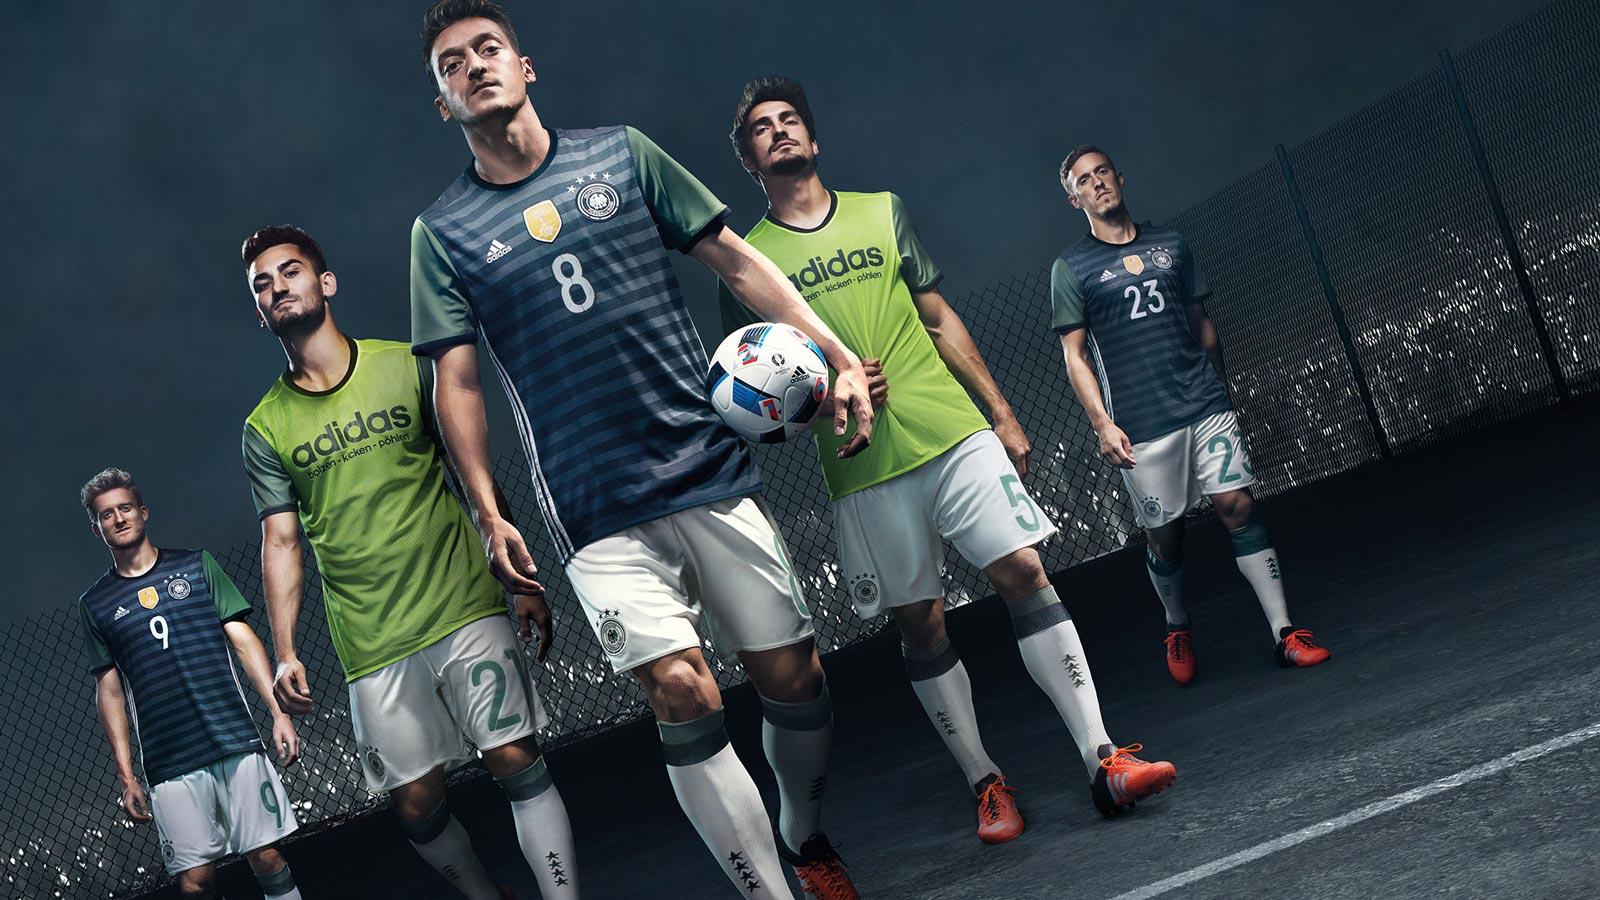 adidas-euro-2016-kits-feature-ridiculous